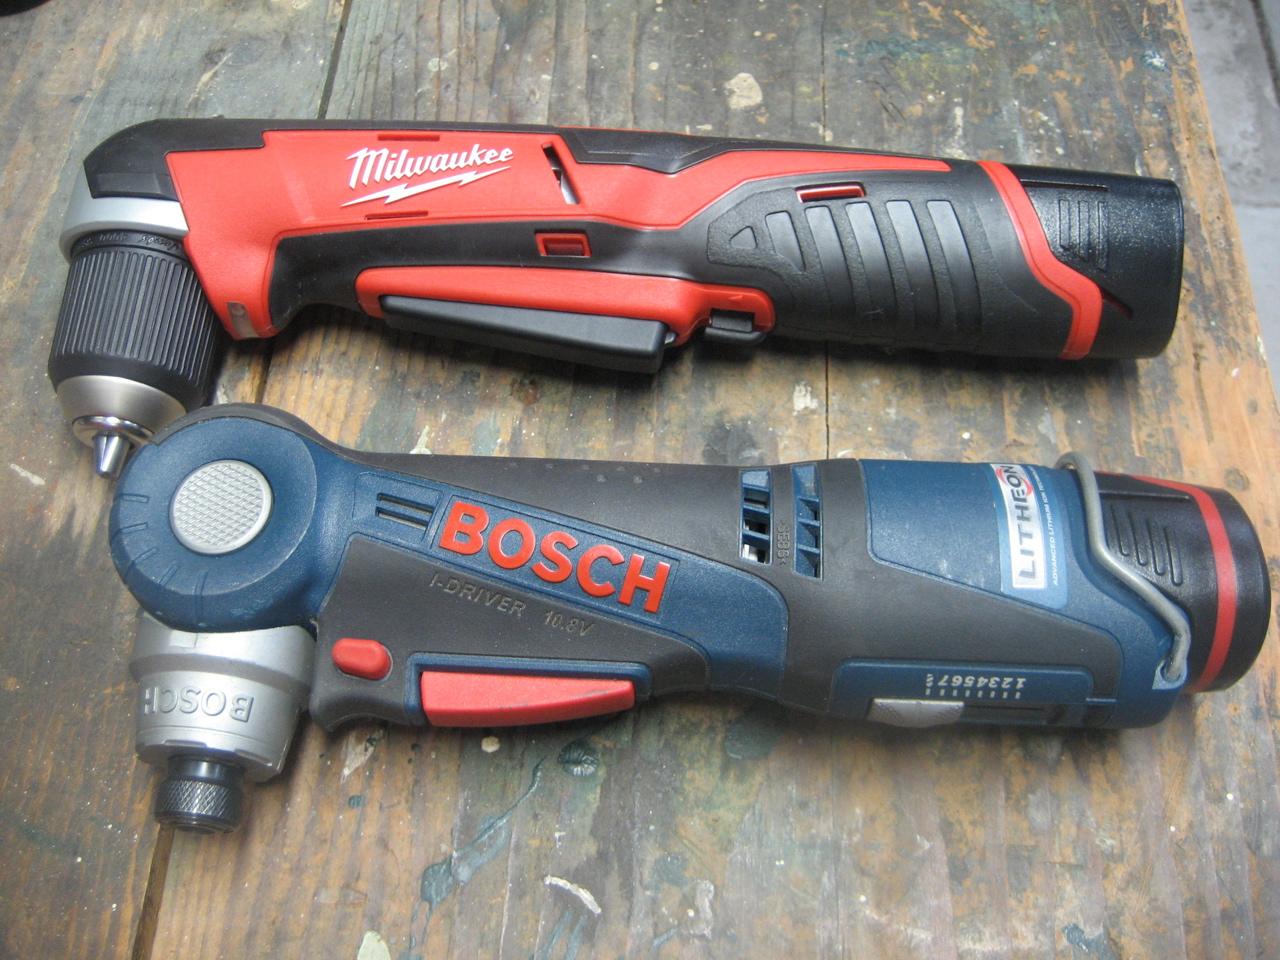 bosch right angle drill. milwaukee bosch right angle drill